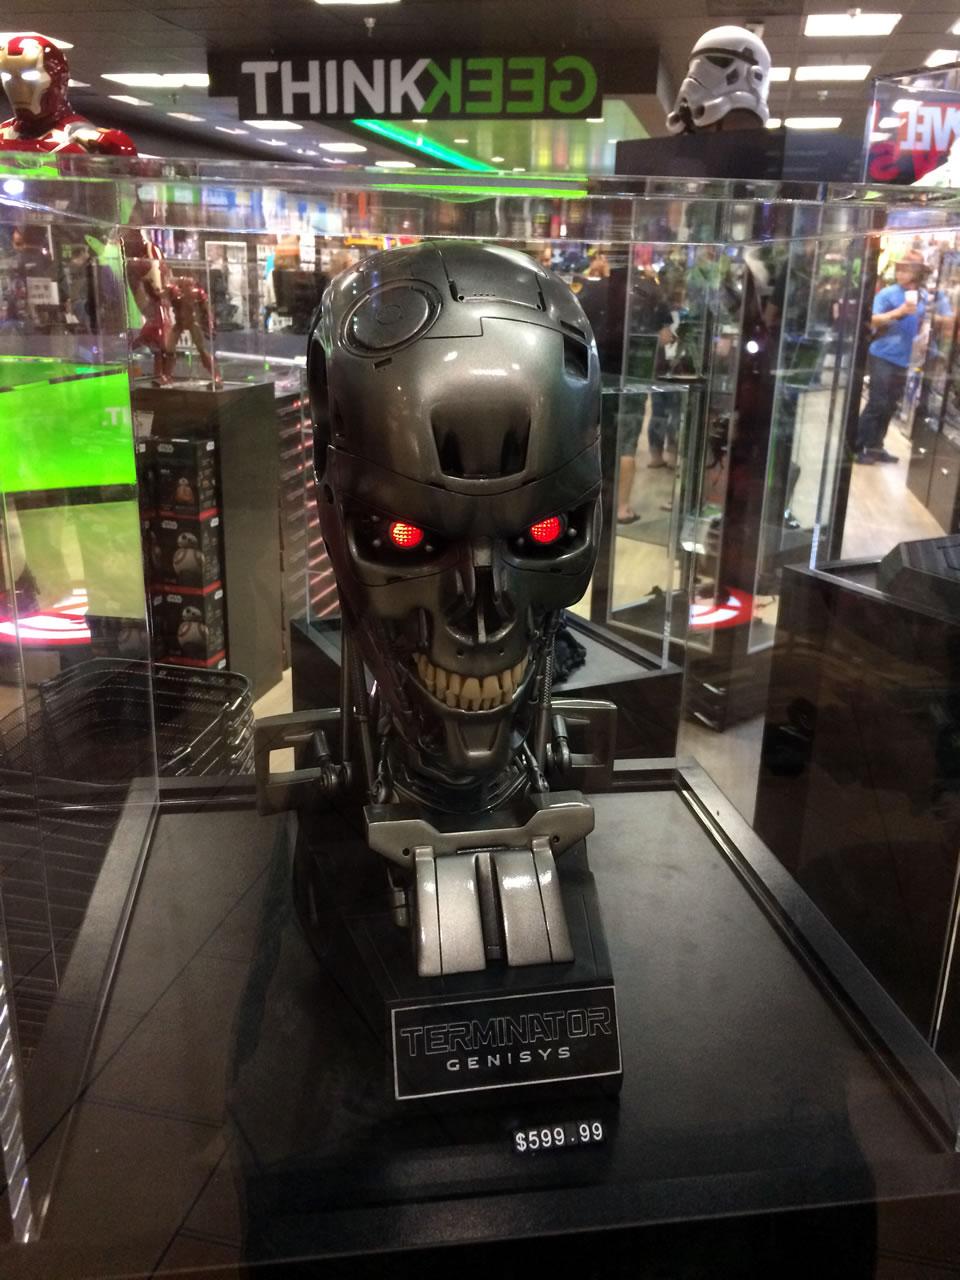 05 thinkgeek store - terminator genisys head